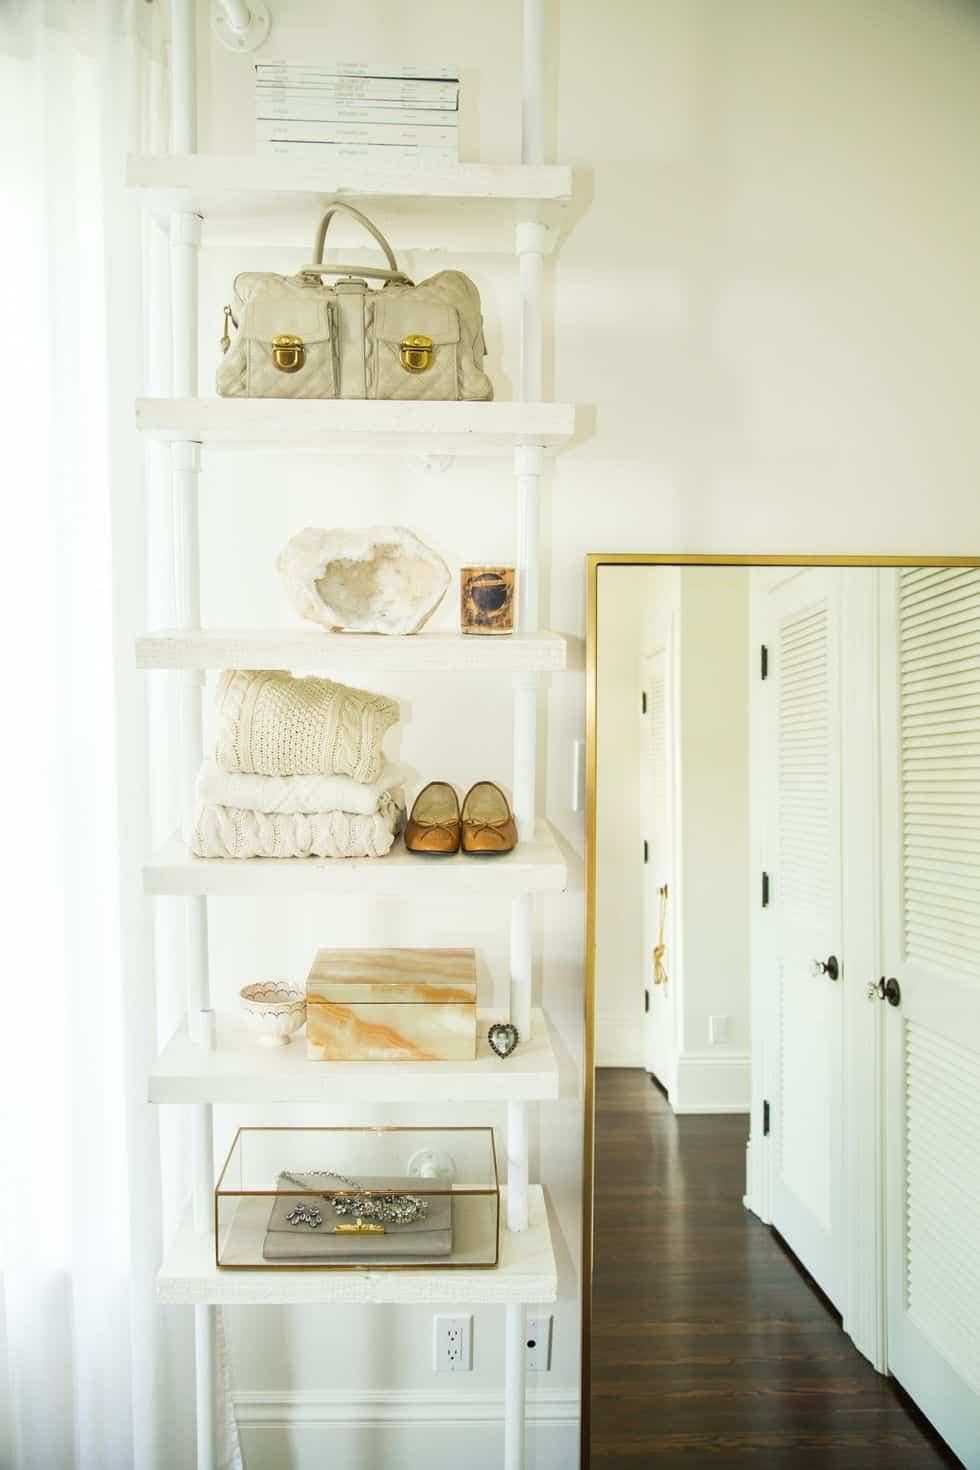 closet organization ideas using shelving